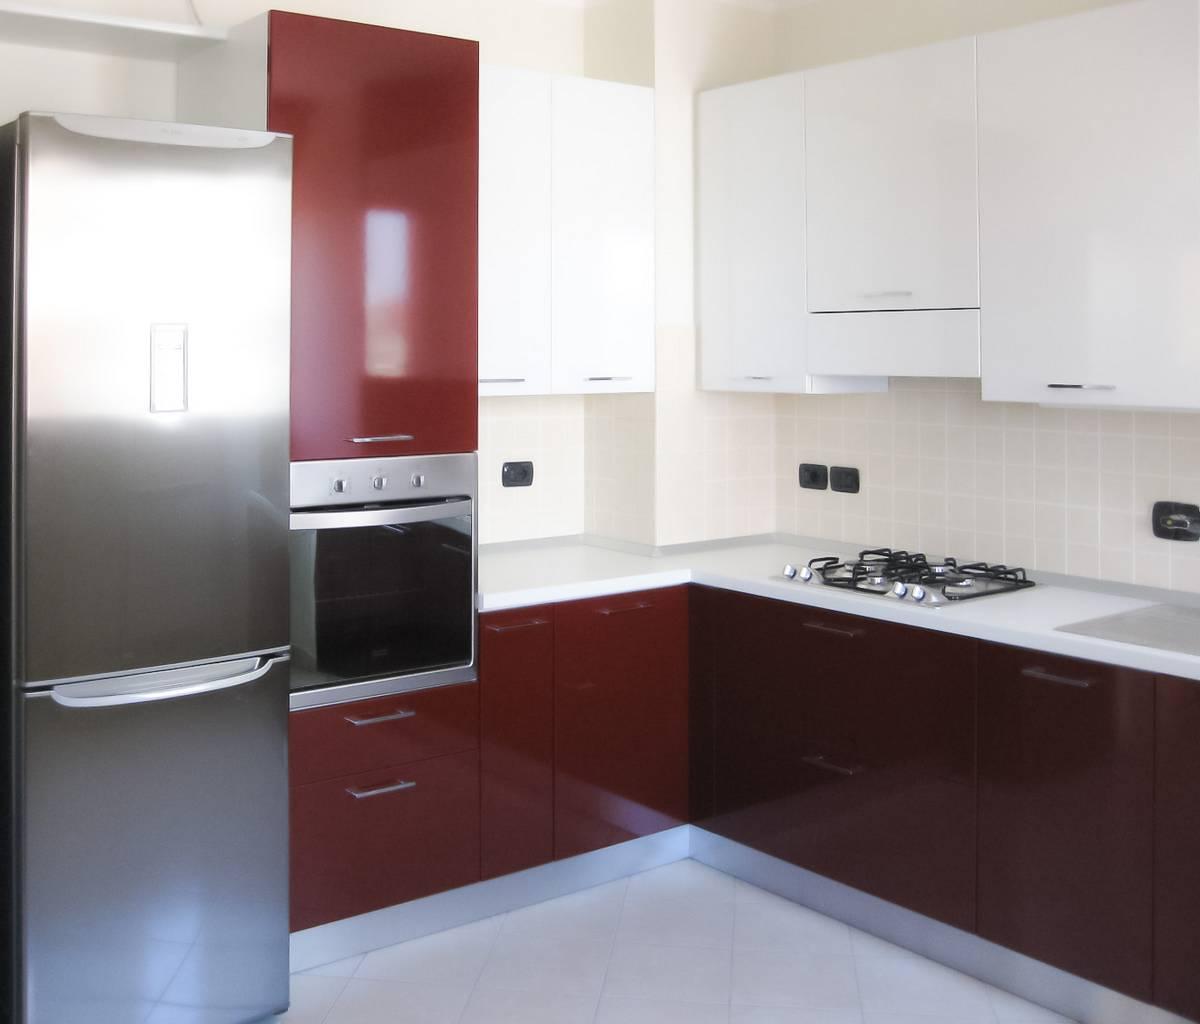 Cucine anta lucida | Cibi - Cucine, bagni, armadi e arredi su misura